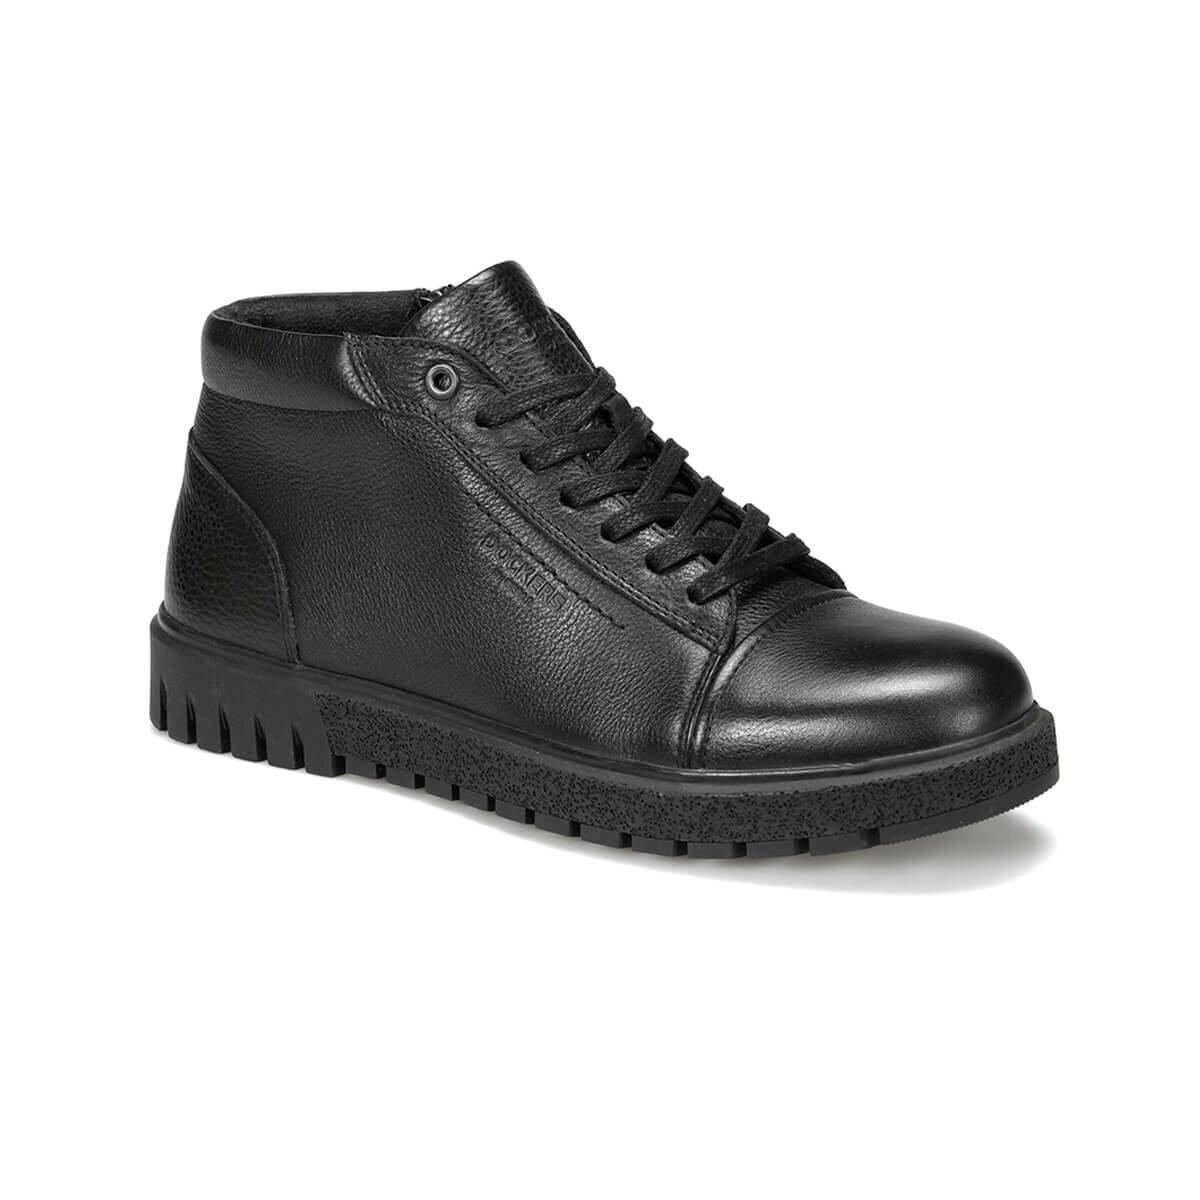 FLO 227111 9PR Black Men Boots By Dockers The Gerle